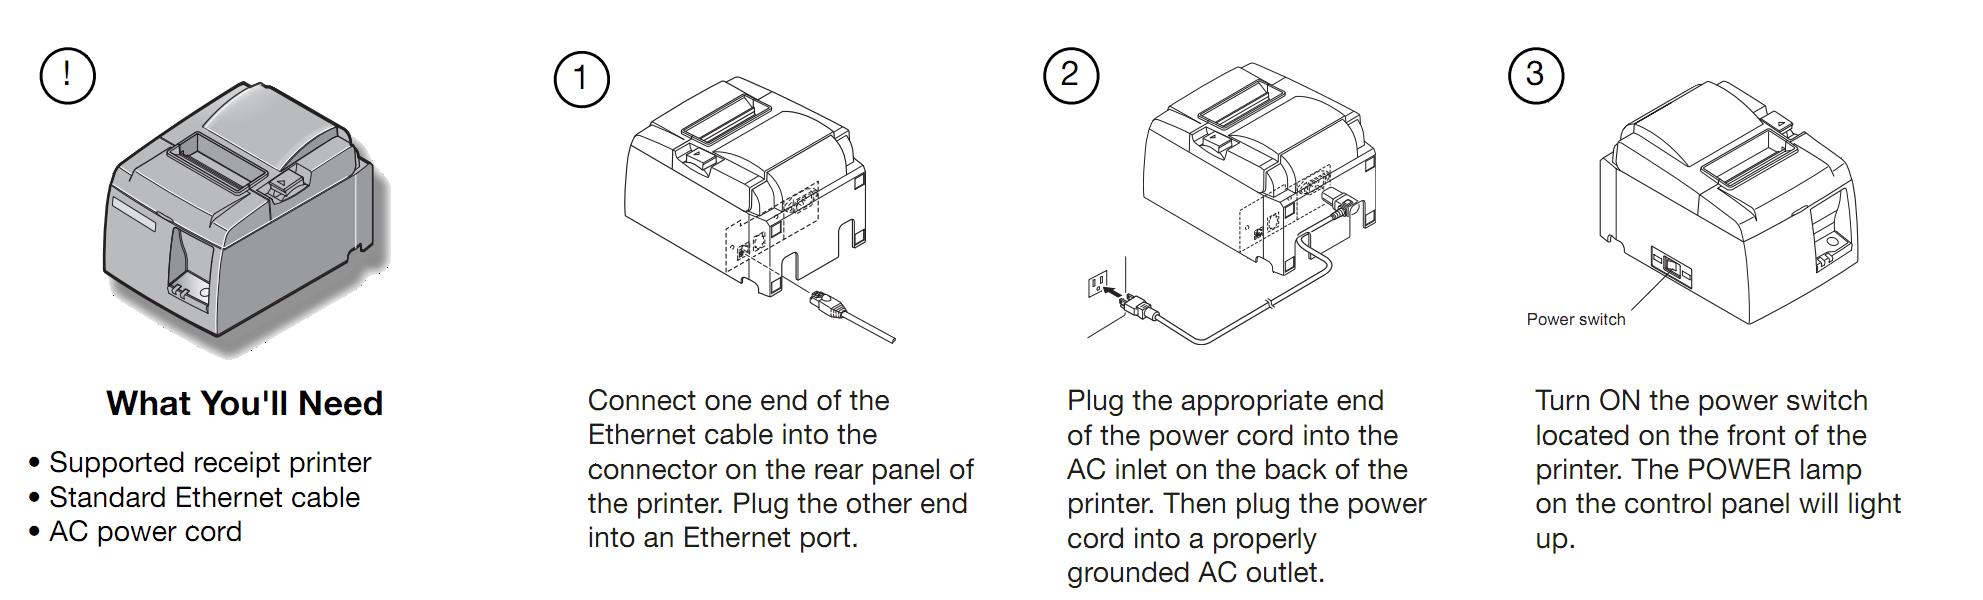 receipt-printer-image.png